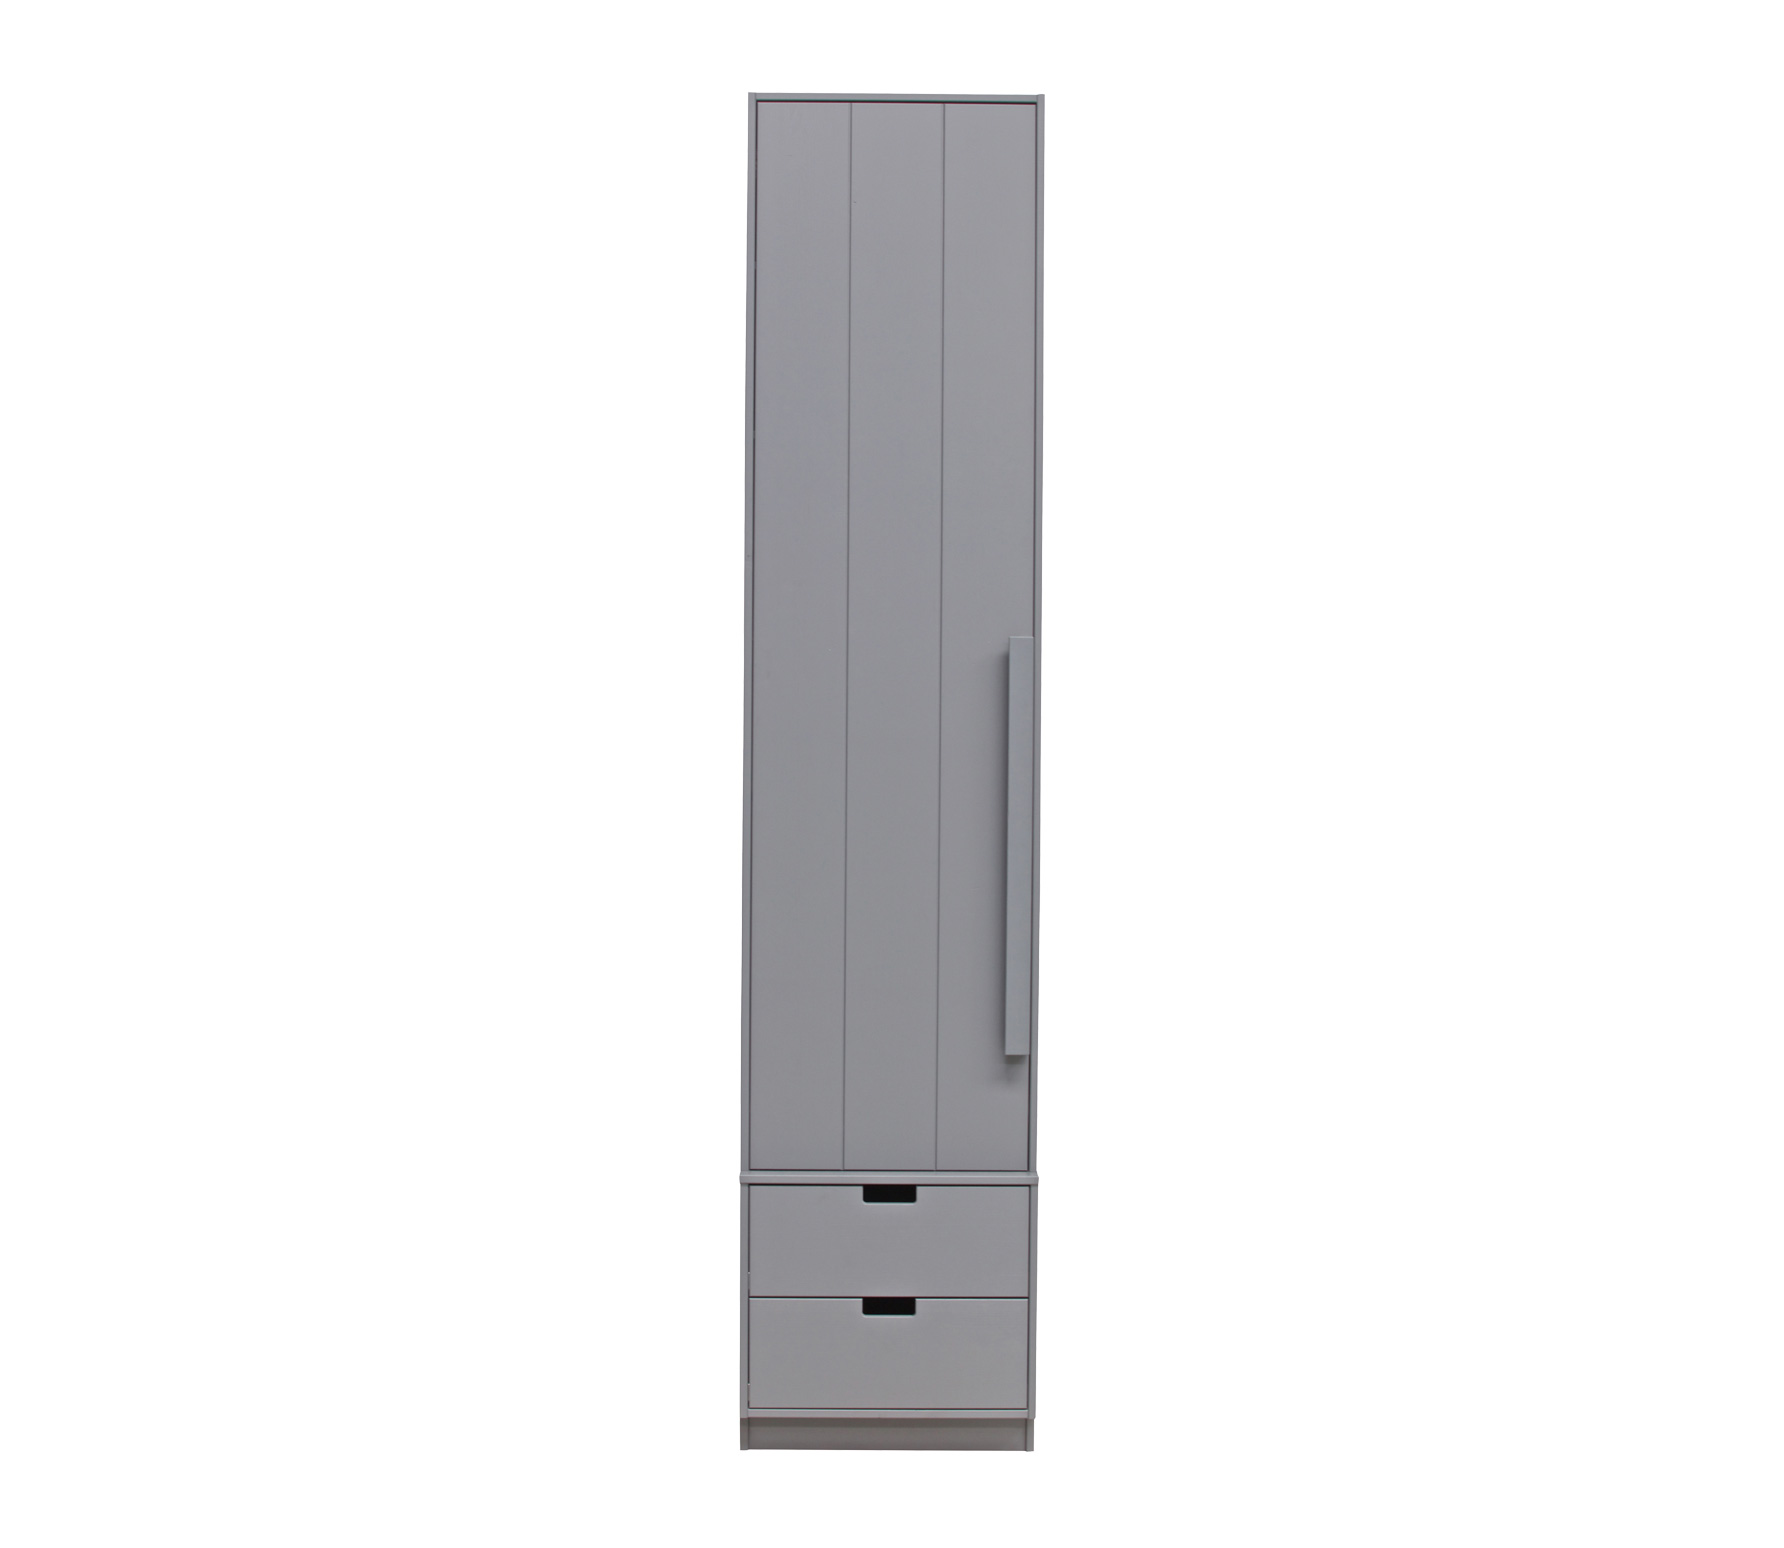 Basiclabel SKIK kast variant 11 leem 231x49x62 cm massief grenen